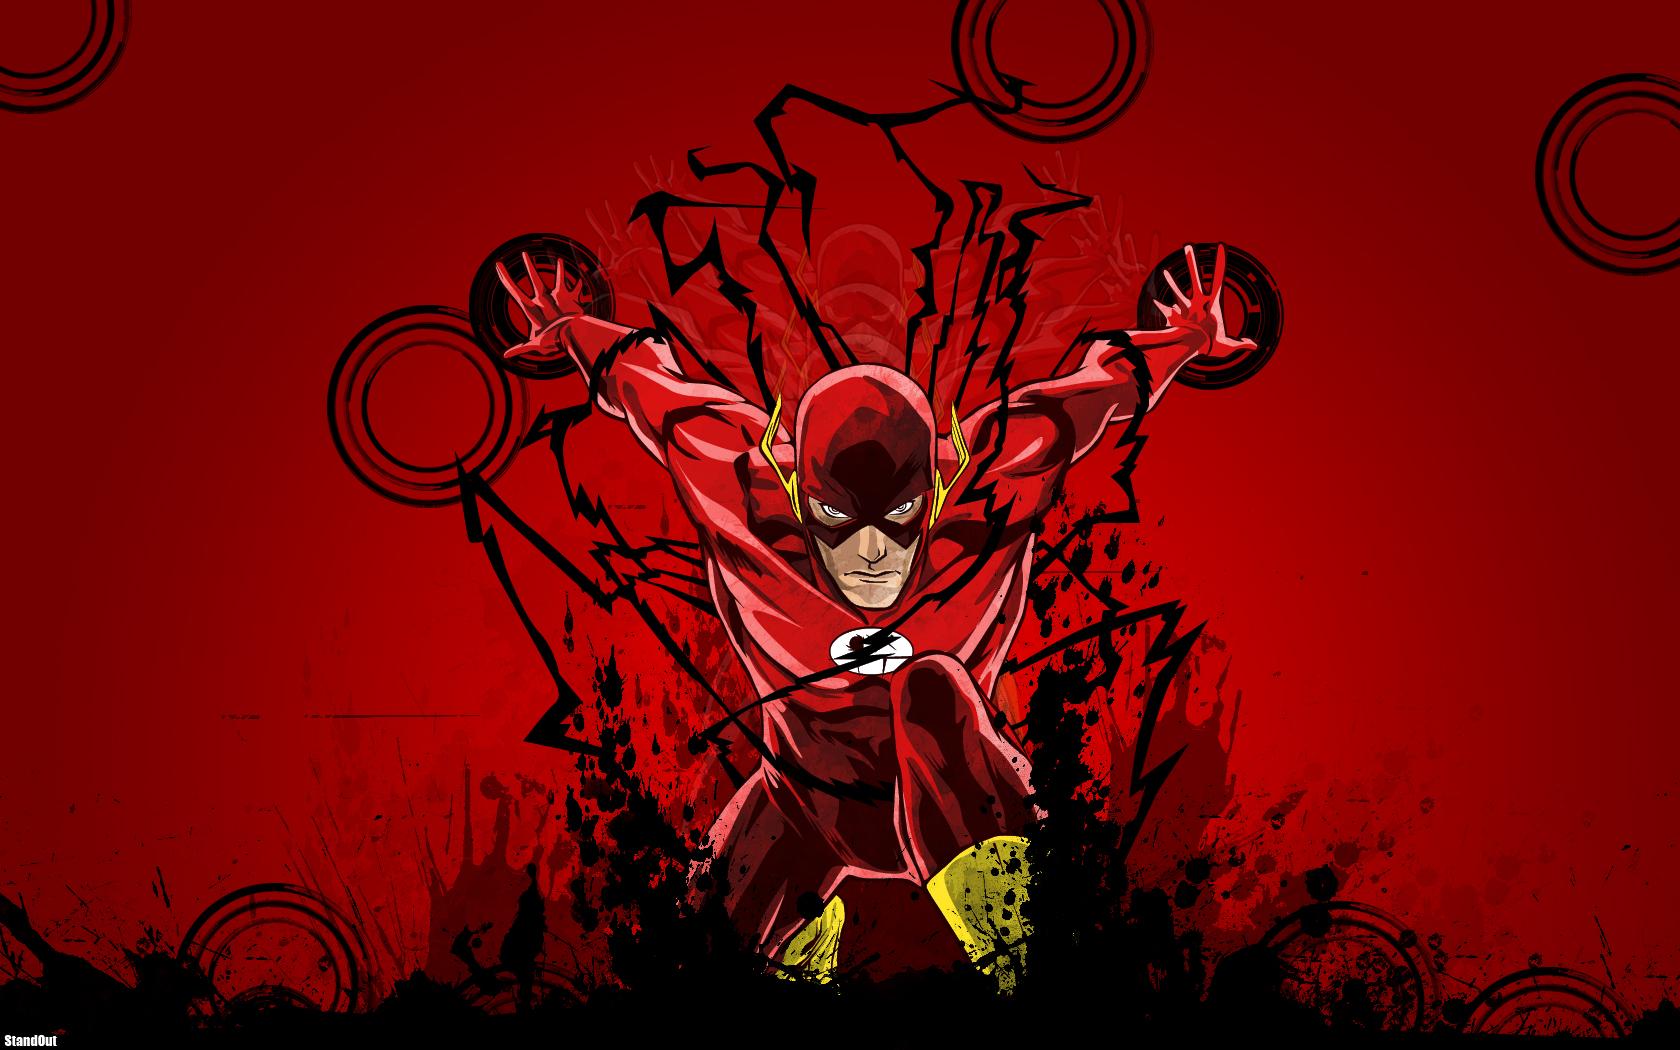 Flash Logo Wallpaper Hd Flash in the night by socketto 1680x1050